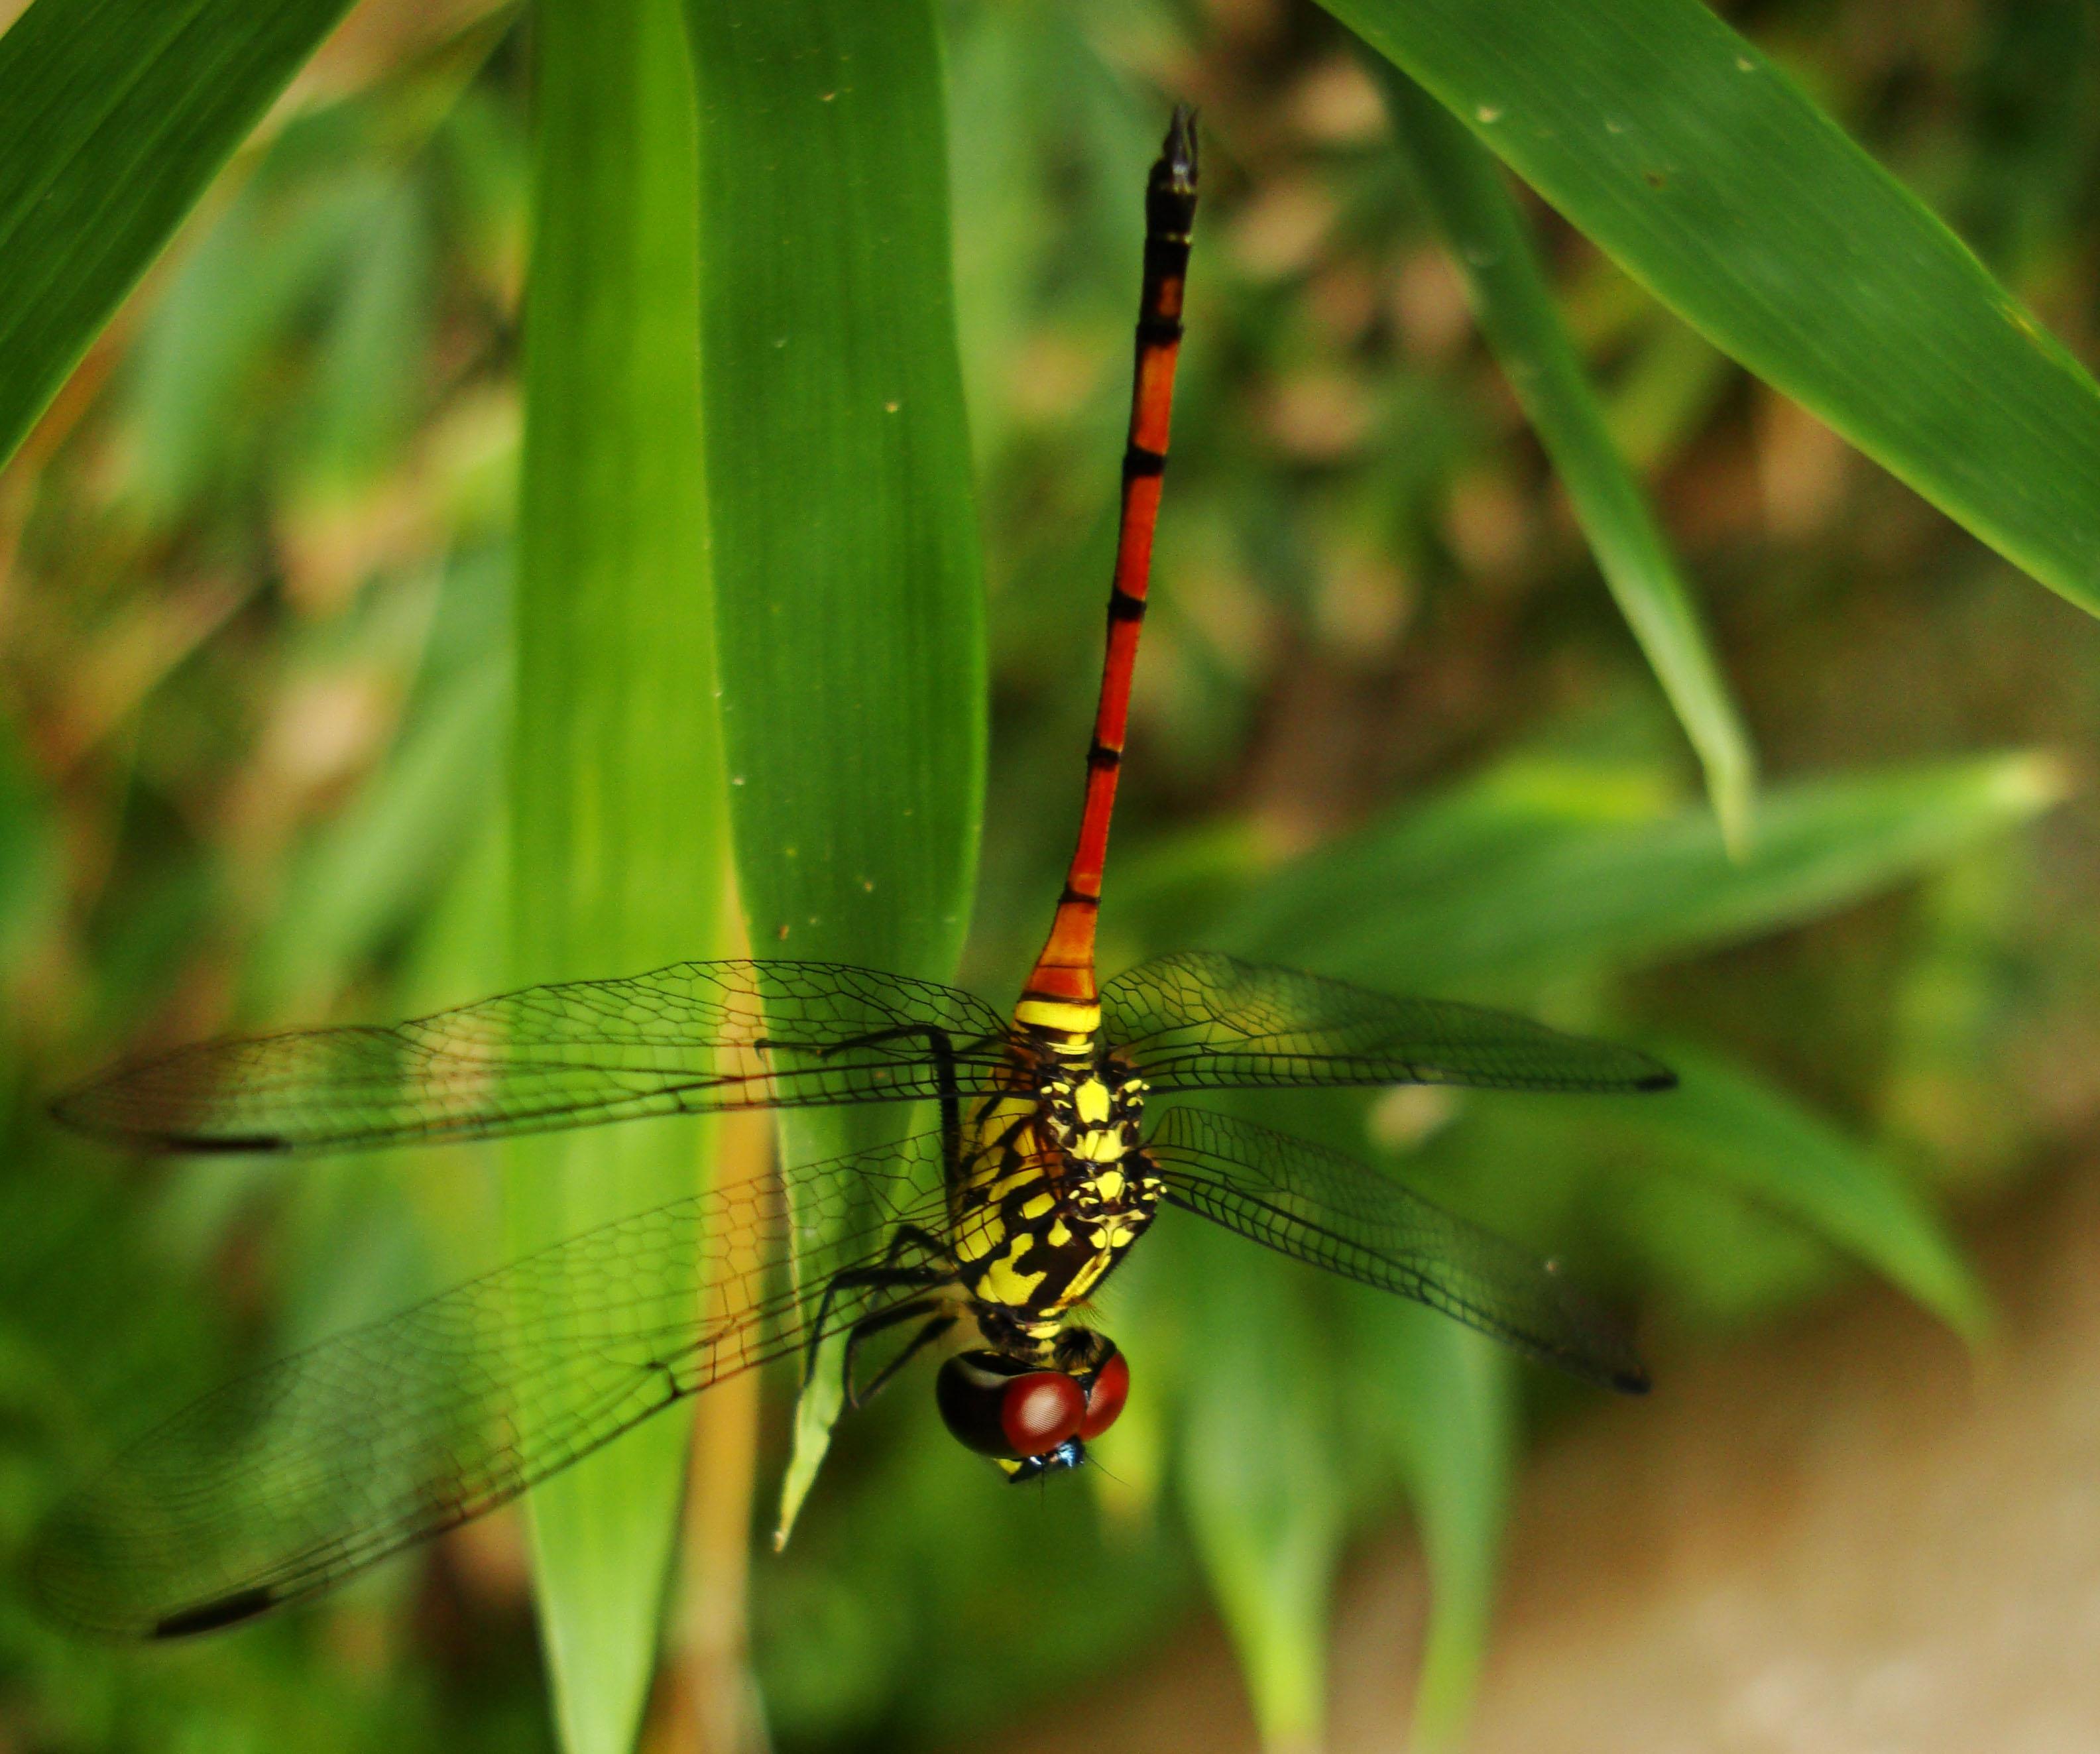 Libellulidae Red Swampdragon Agrionoptera insignis allogenes Sunshine Coast Qld Australia 038